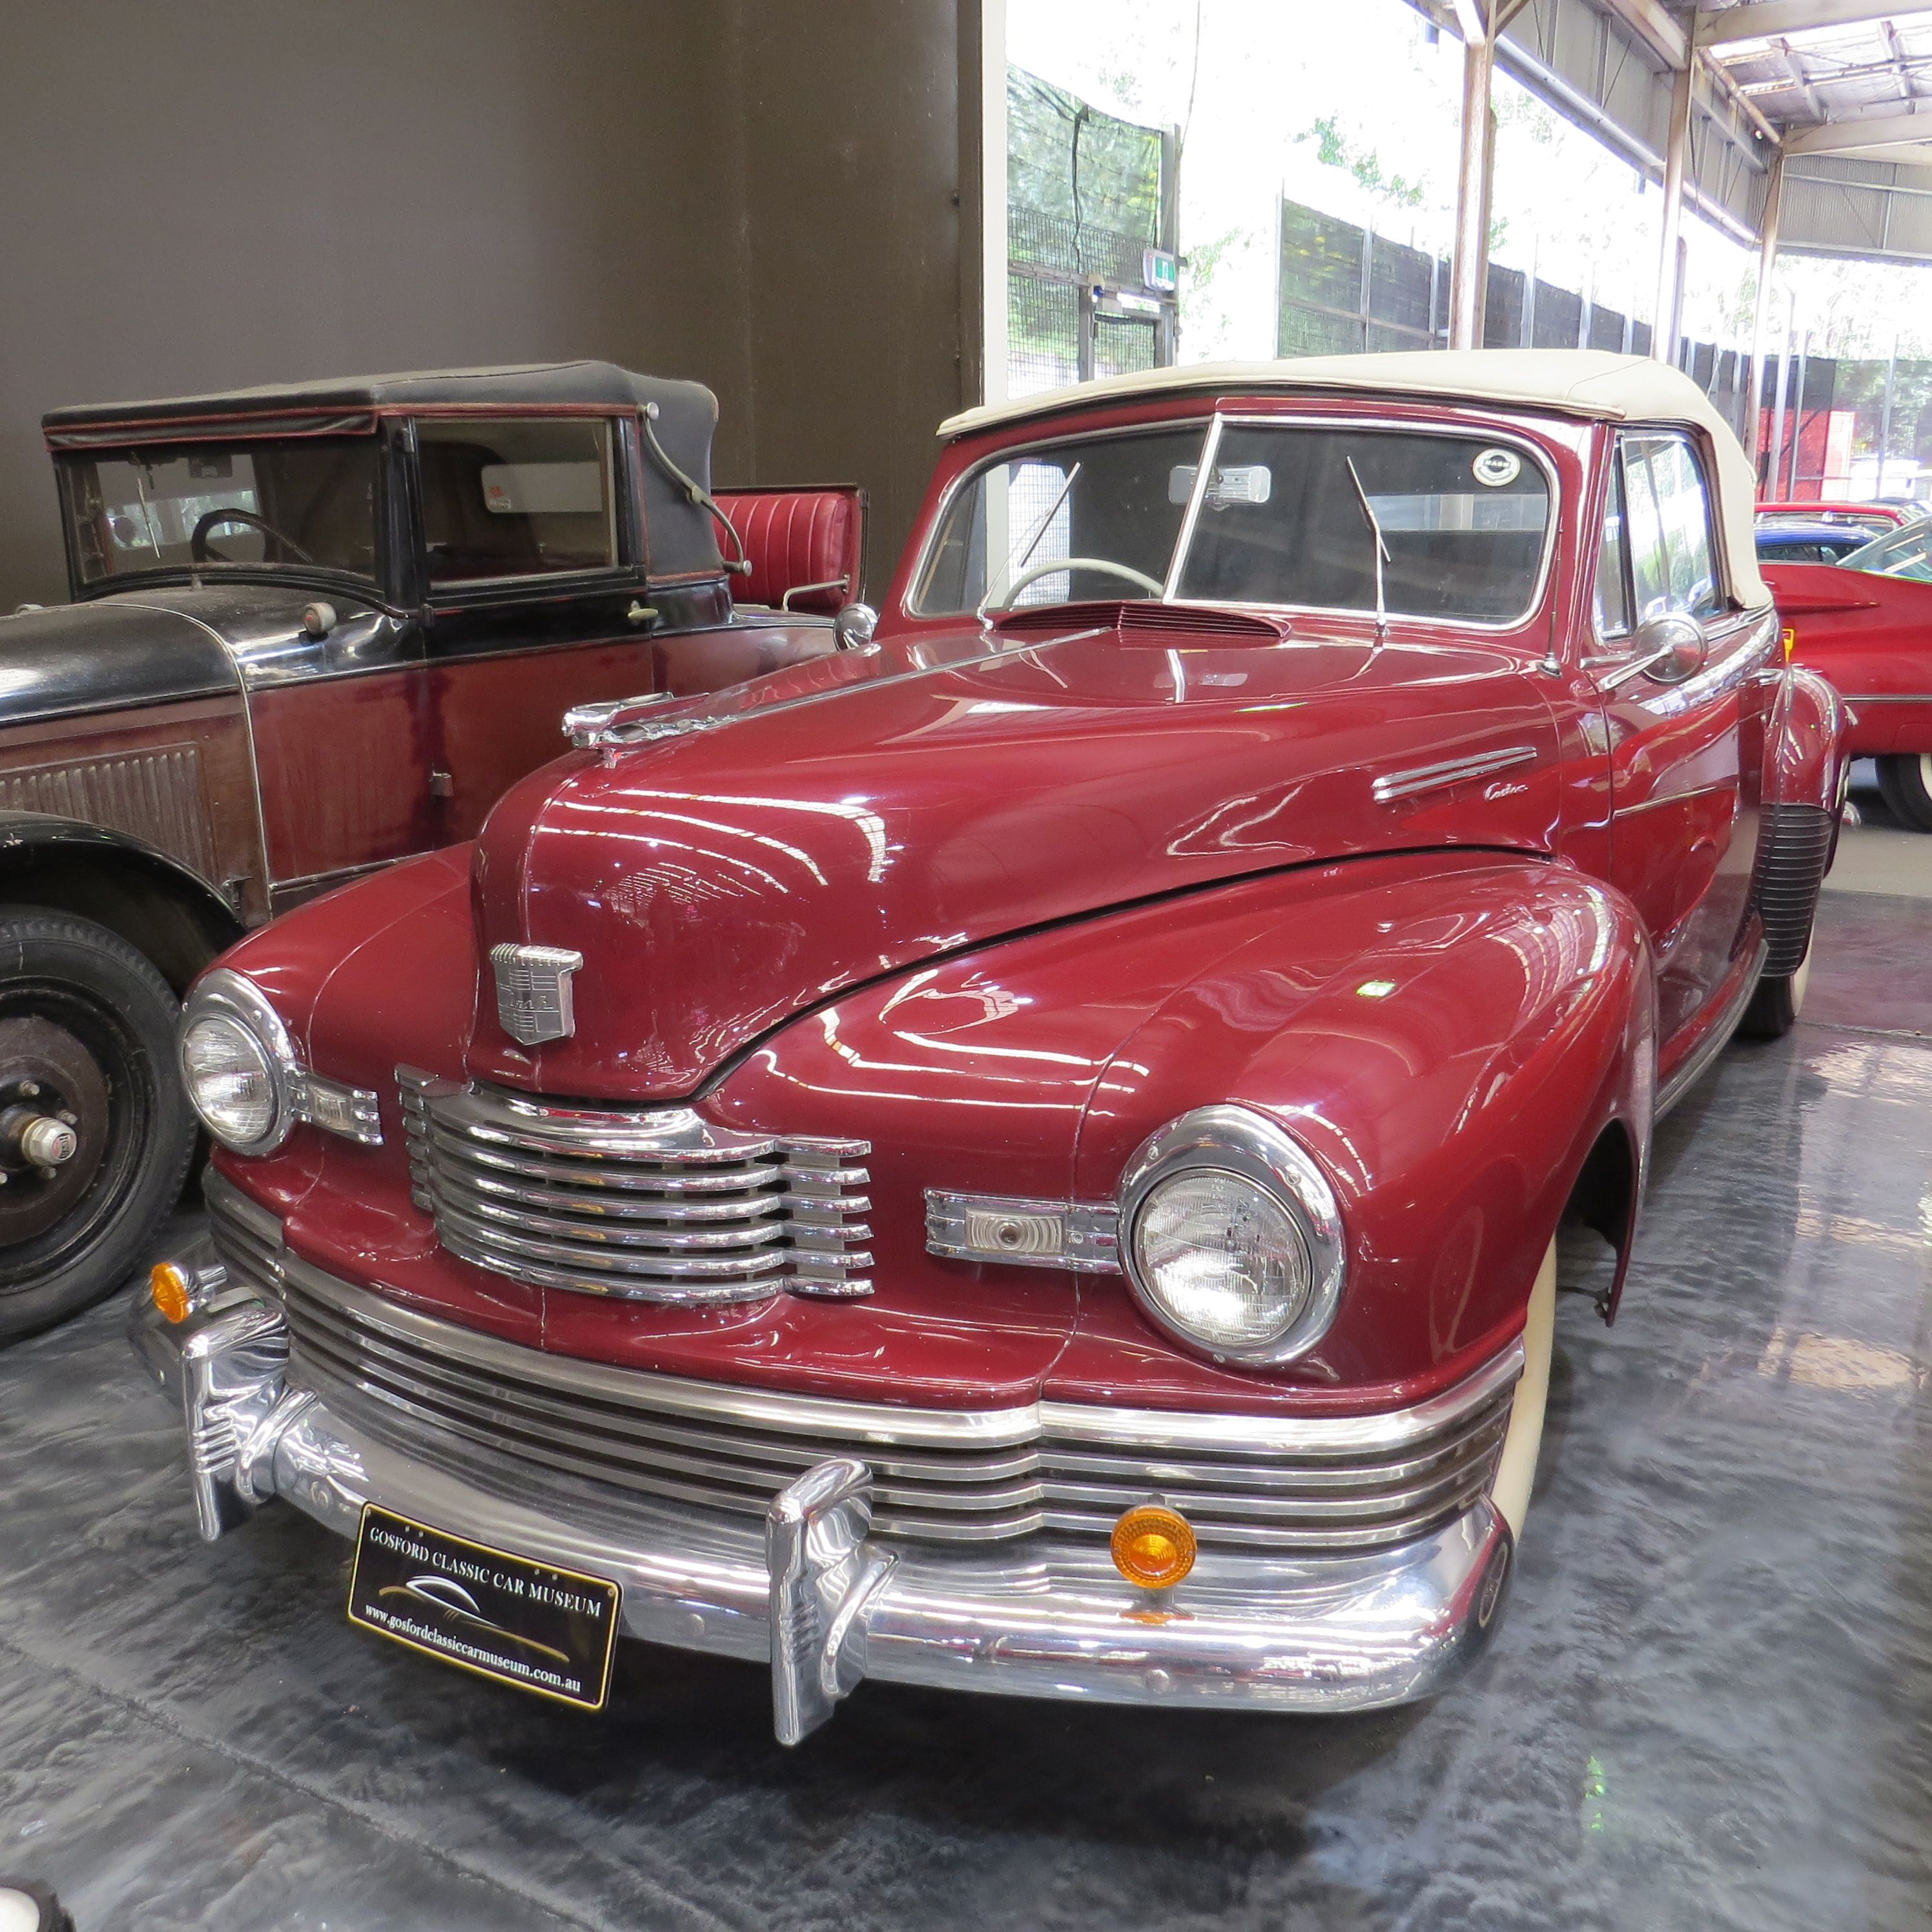 1956 chevrolet belair mjc classic cars pristine - Gosford Classic Car Musuem